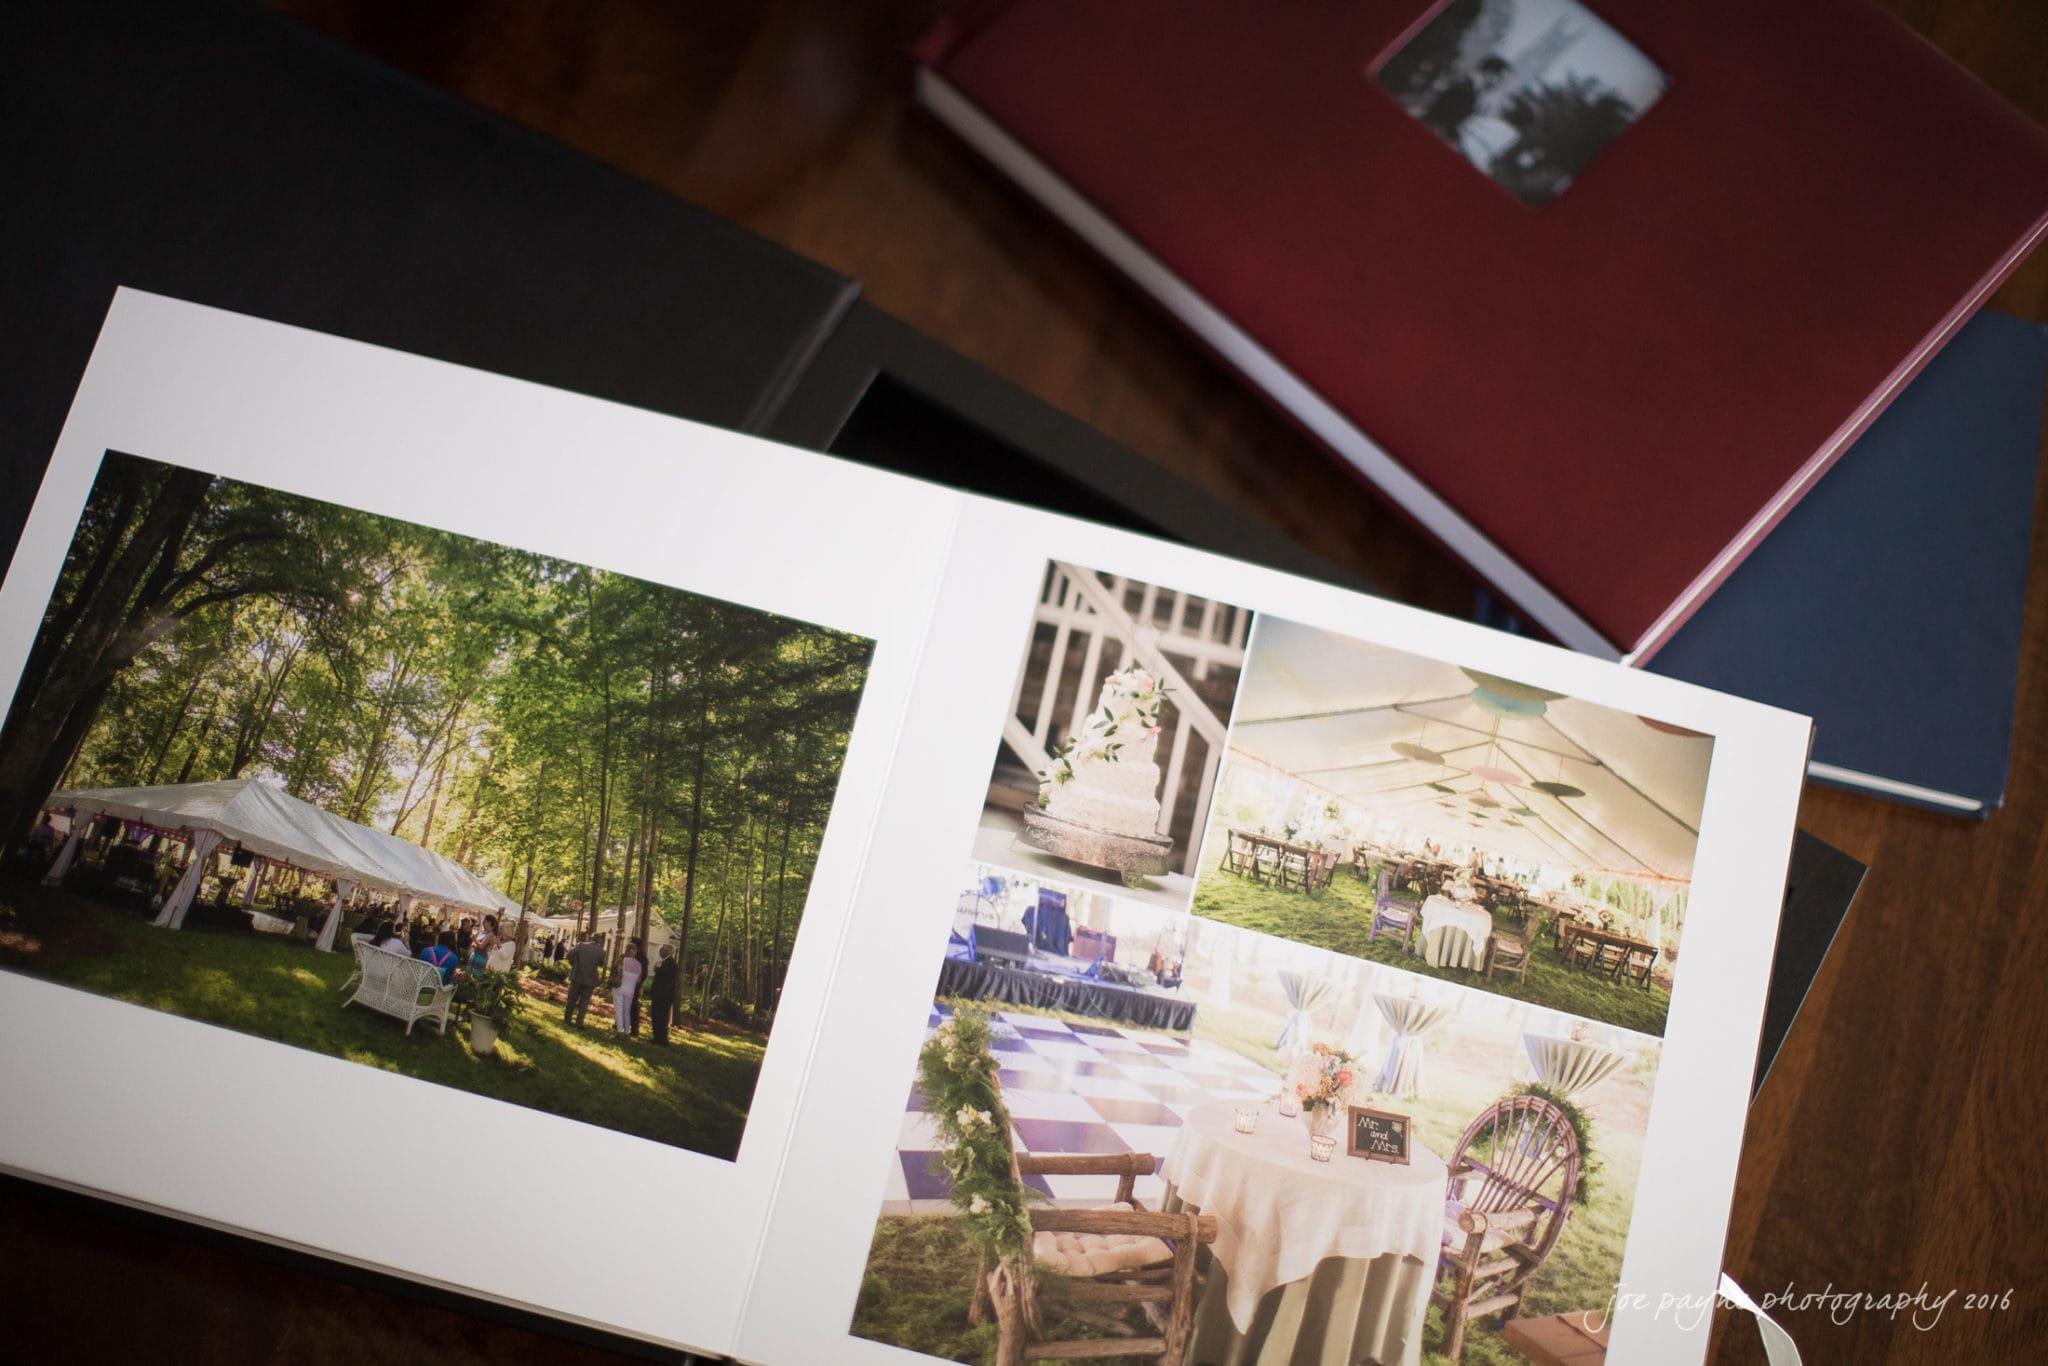 raleigh-wedding-photographer-joe-payne-photography-albums-4